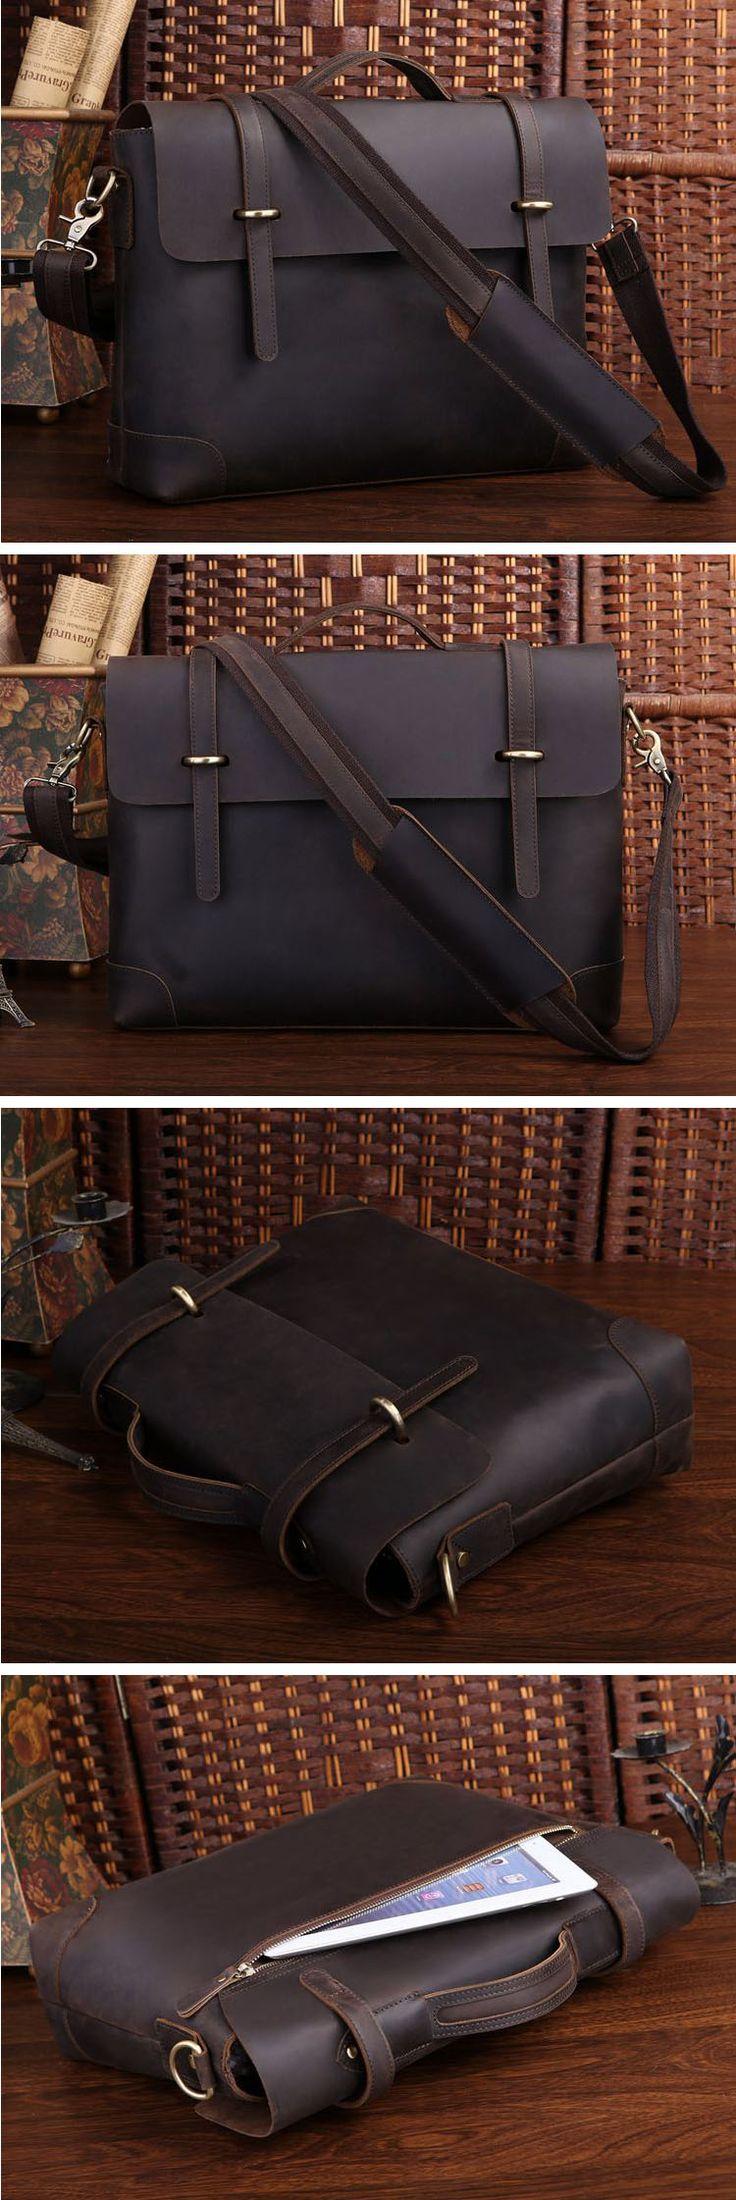 "Crazy Horse leather Briefcase Laptop Messenger Ipad 14"" 15"" Laptop 15"" Macbook Tote Bag"